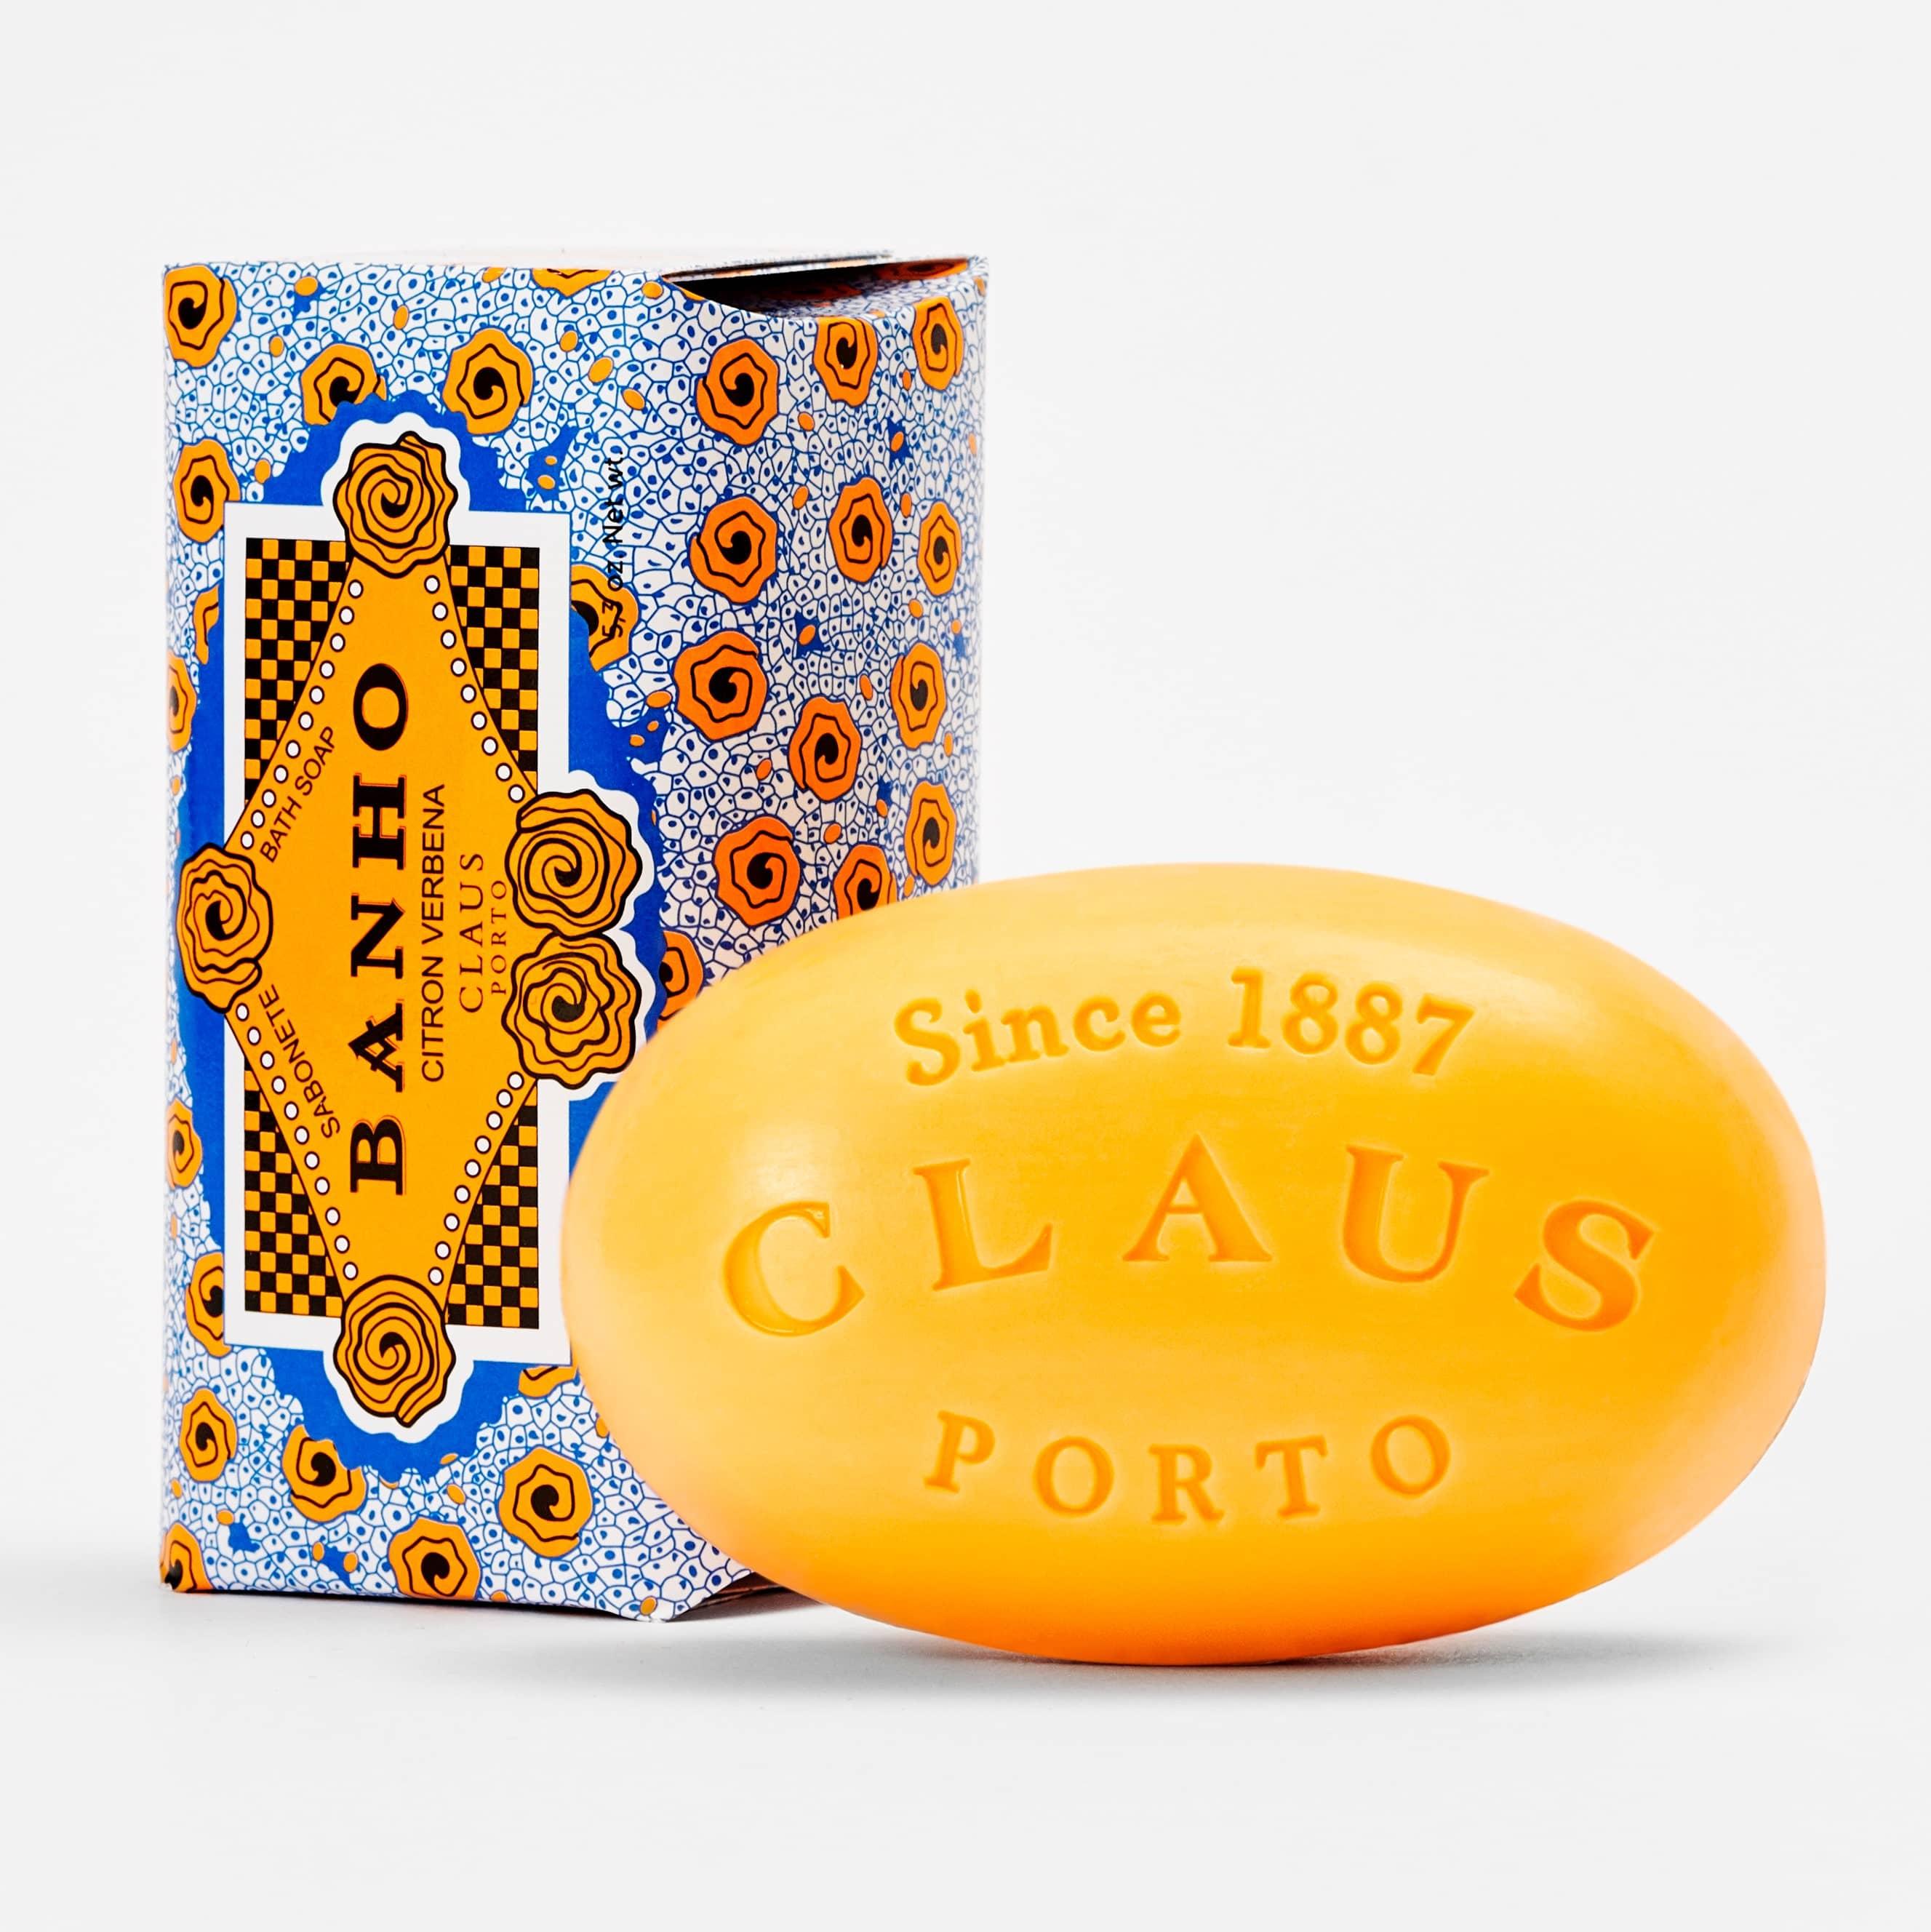 "CLAUS PORTO - Seife Deco Kollektion ""Banho"""